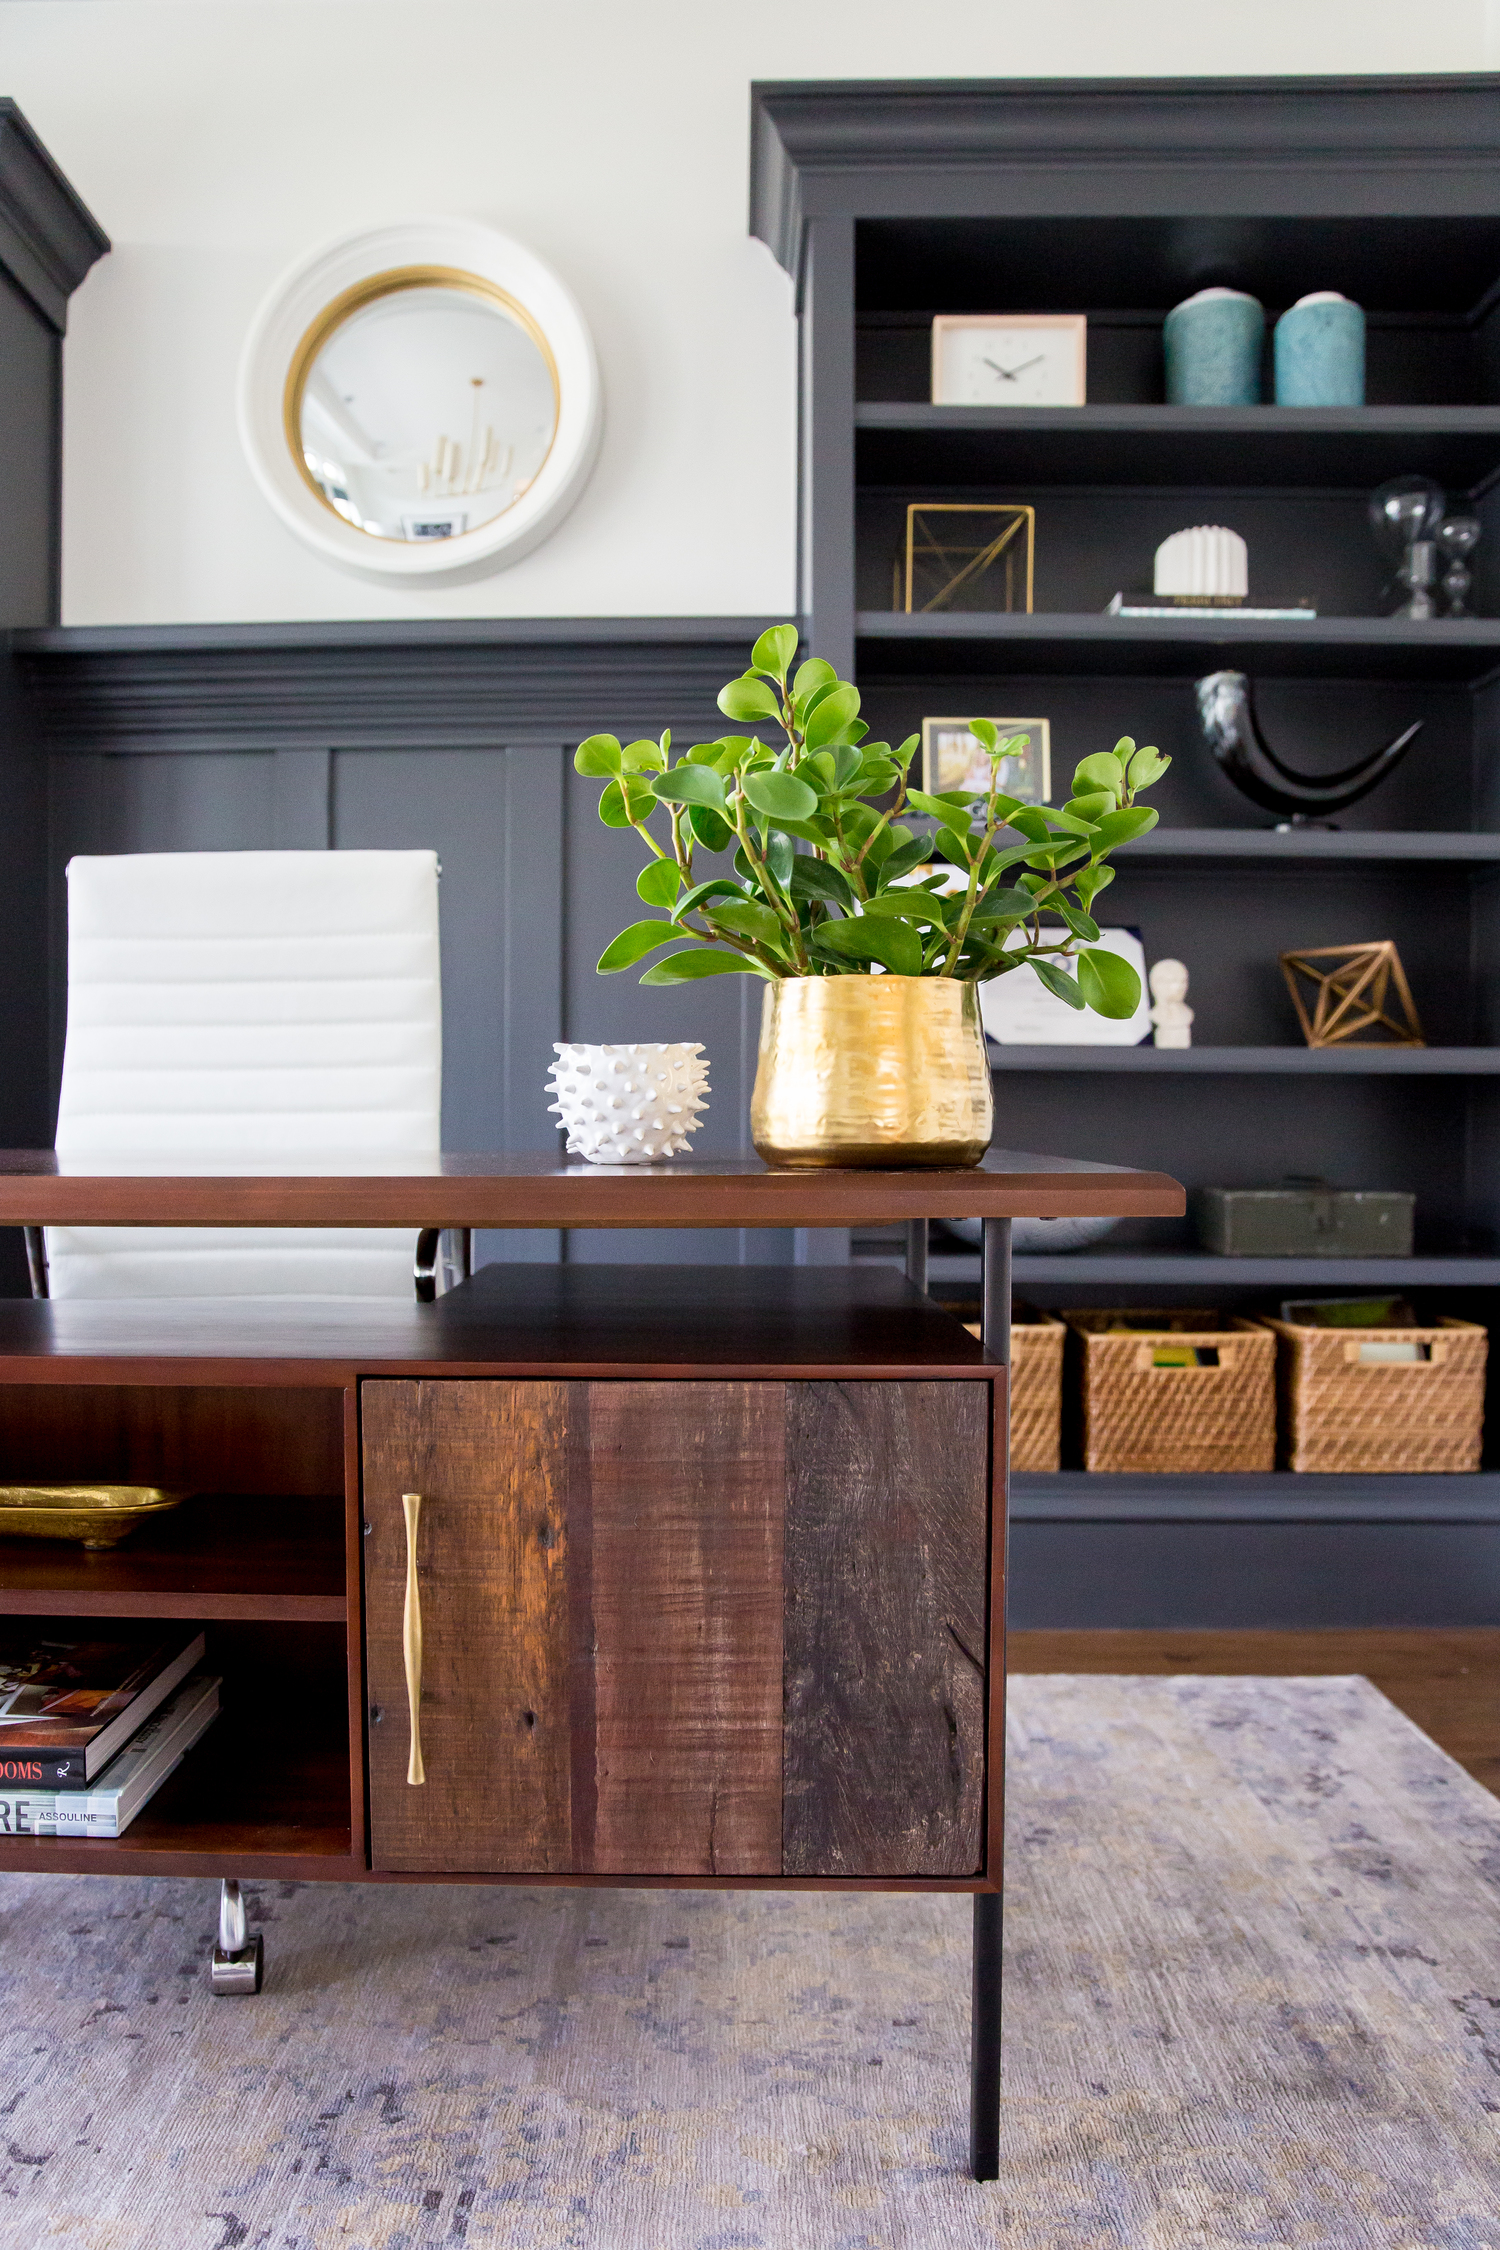 Rustic desk in front of built in shelves